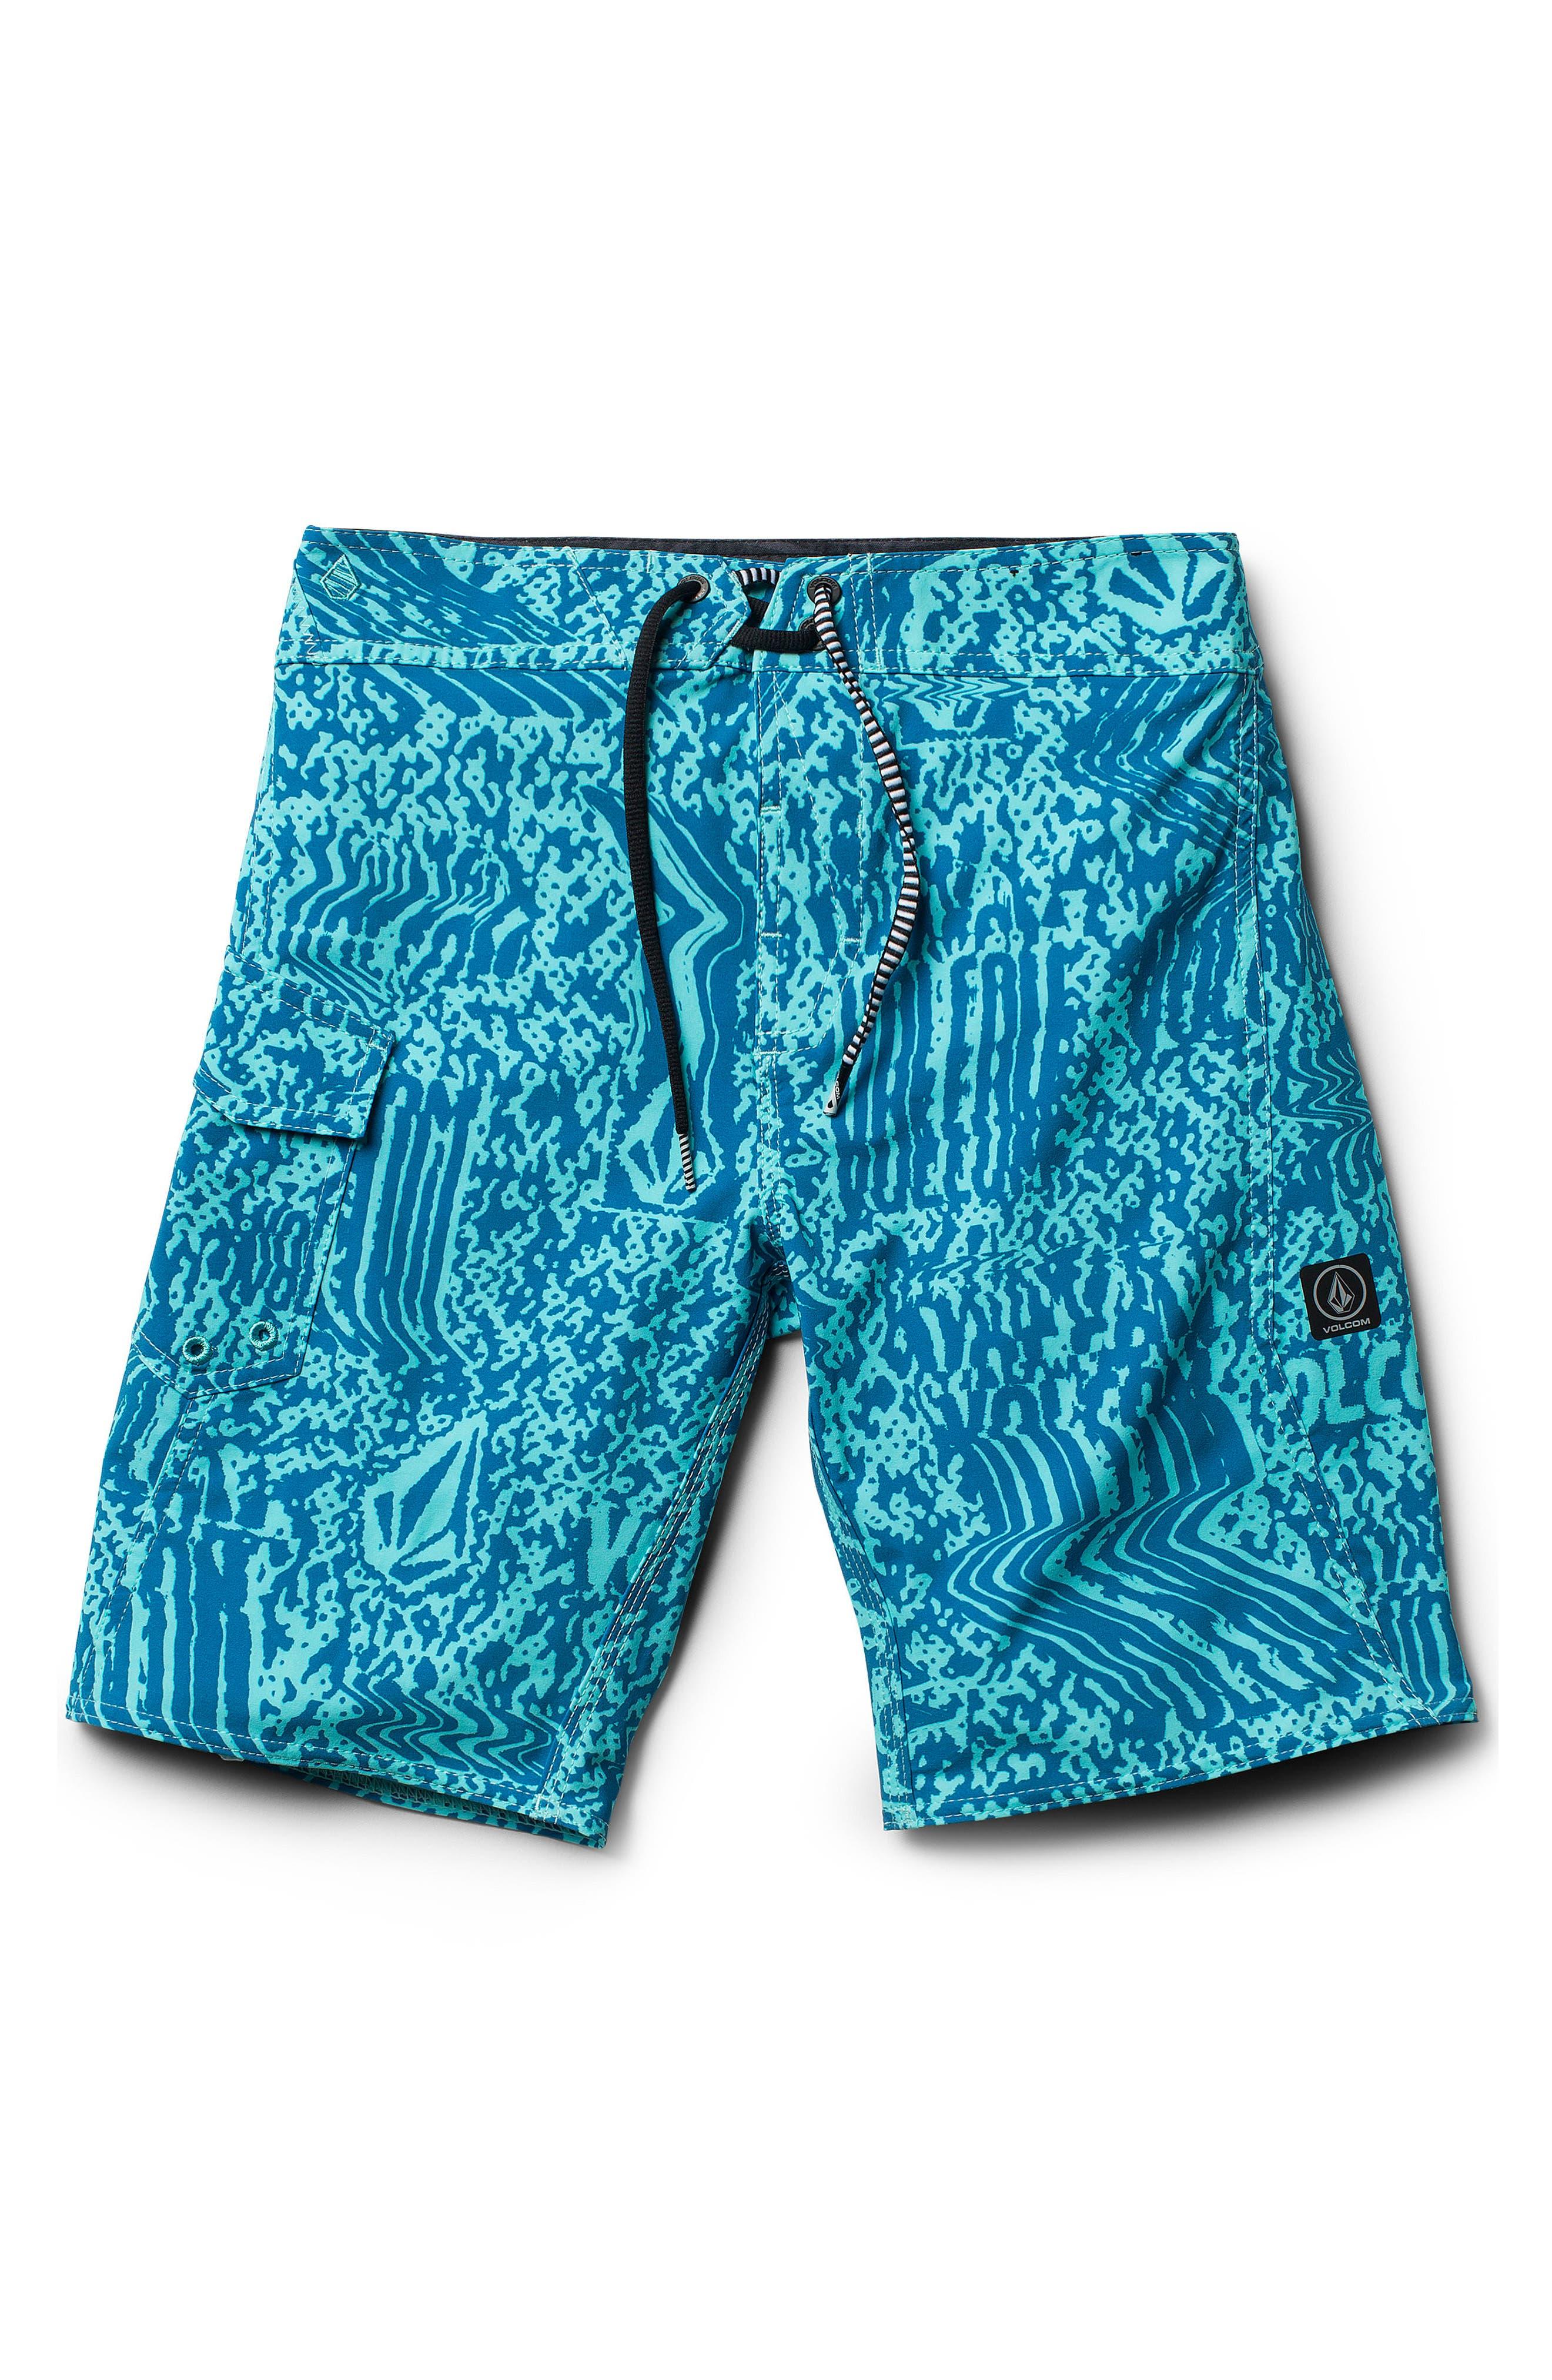 Logo Plasm Mod Board Shorts,                             Main thumbnail 1, color,                             Bright Turquoise